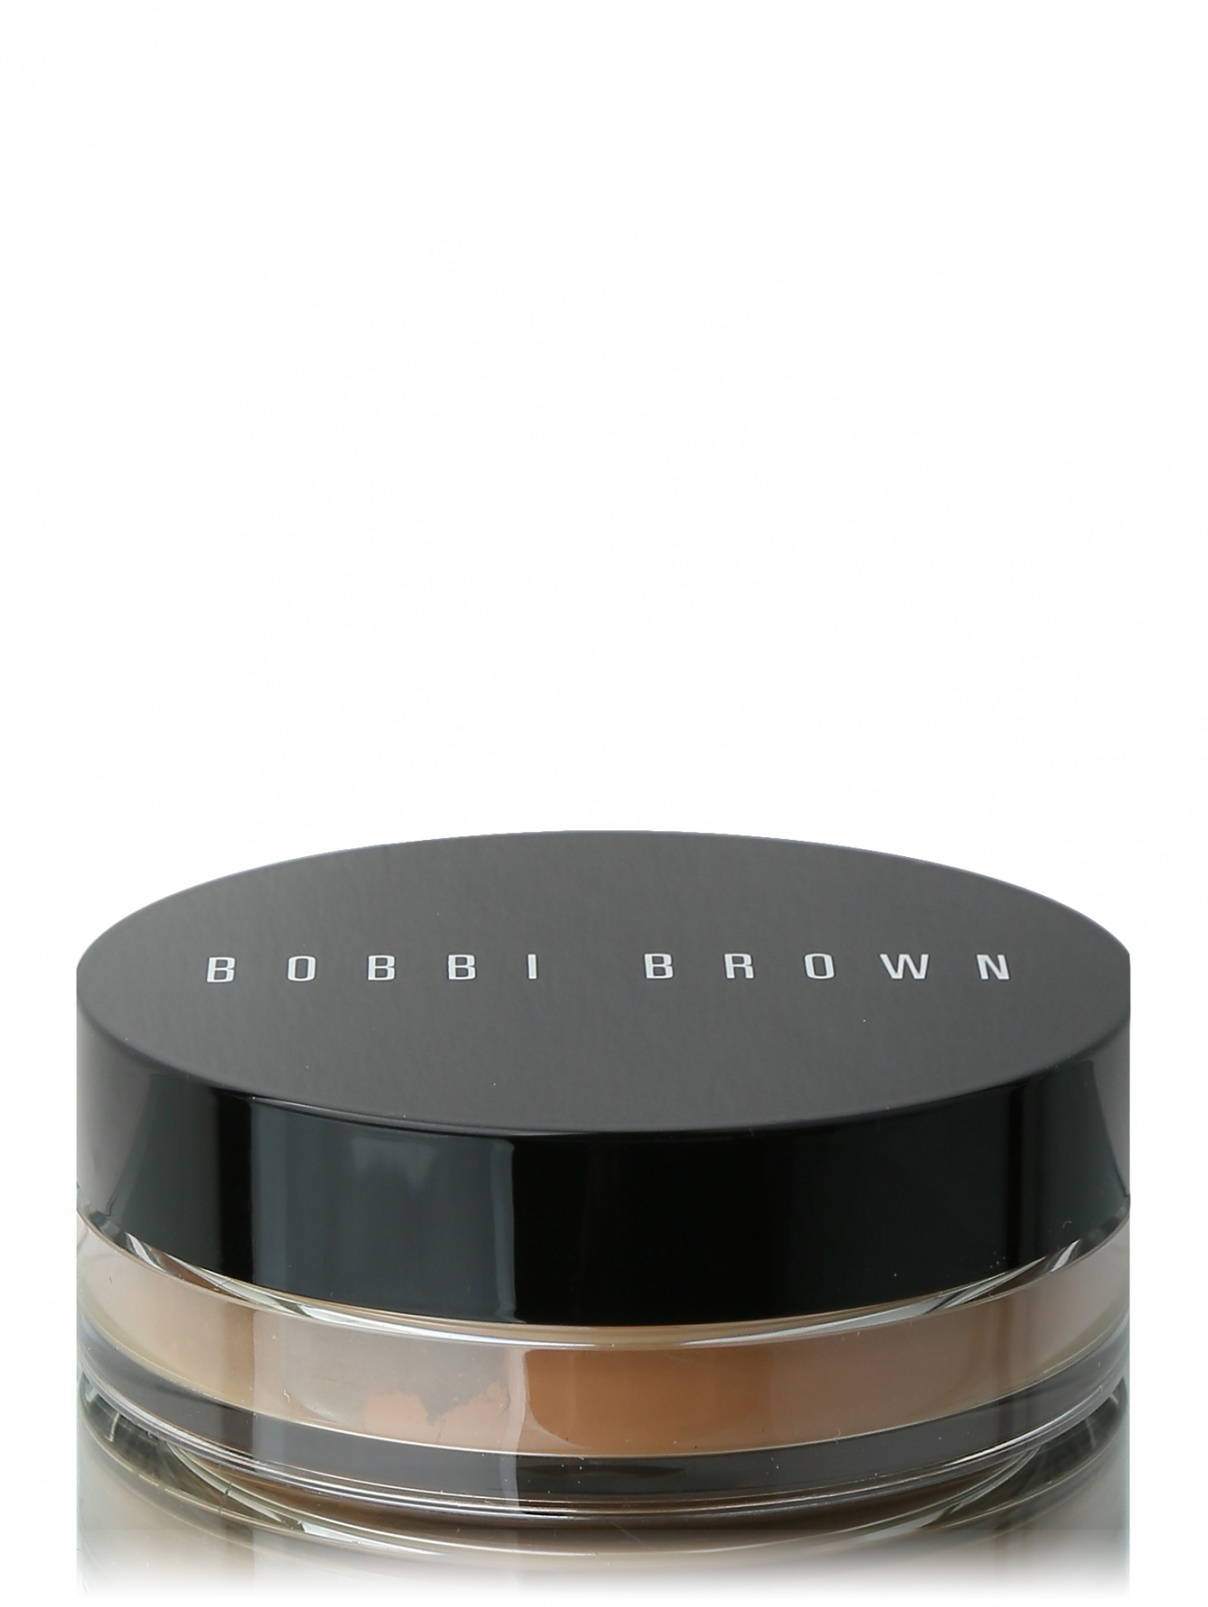 Корректирующая пудра Brown Makeup Bobbi Brown  –  Общий вид